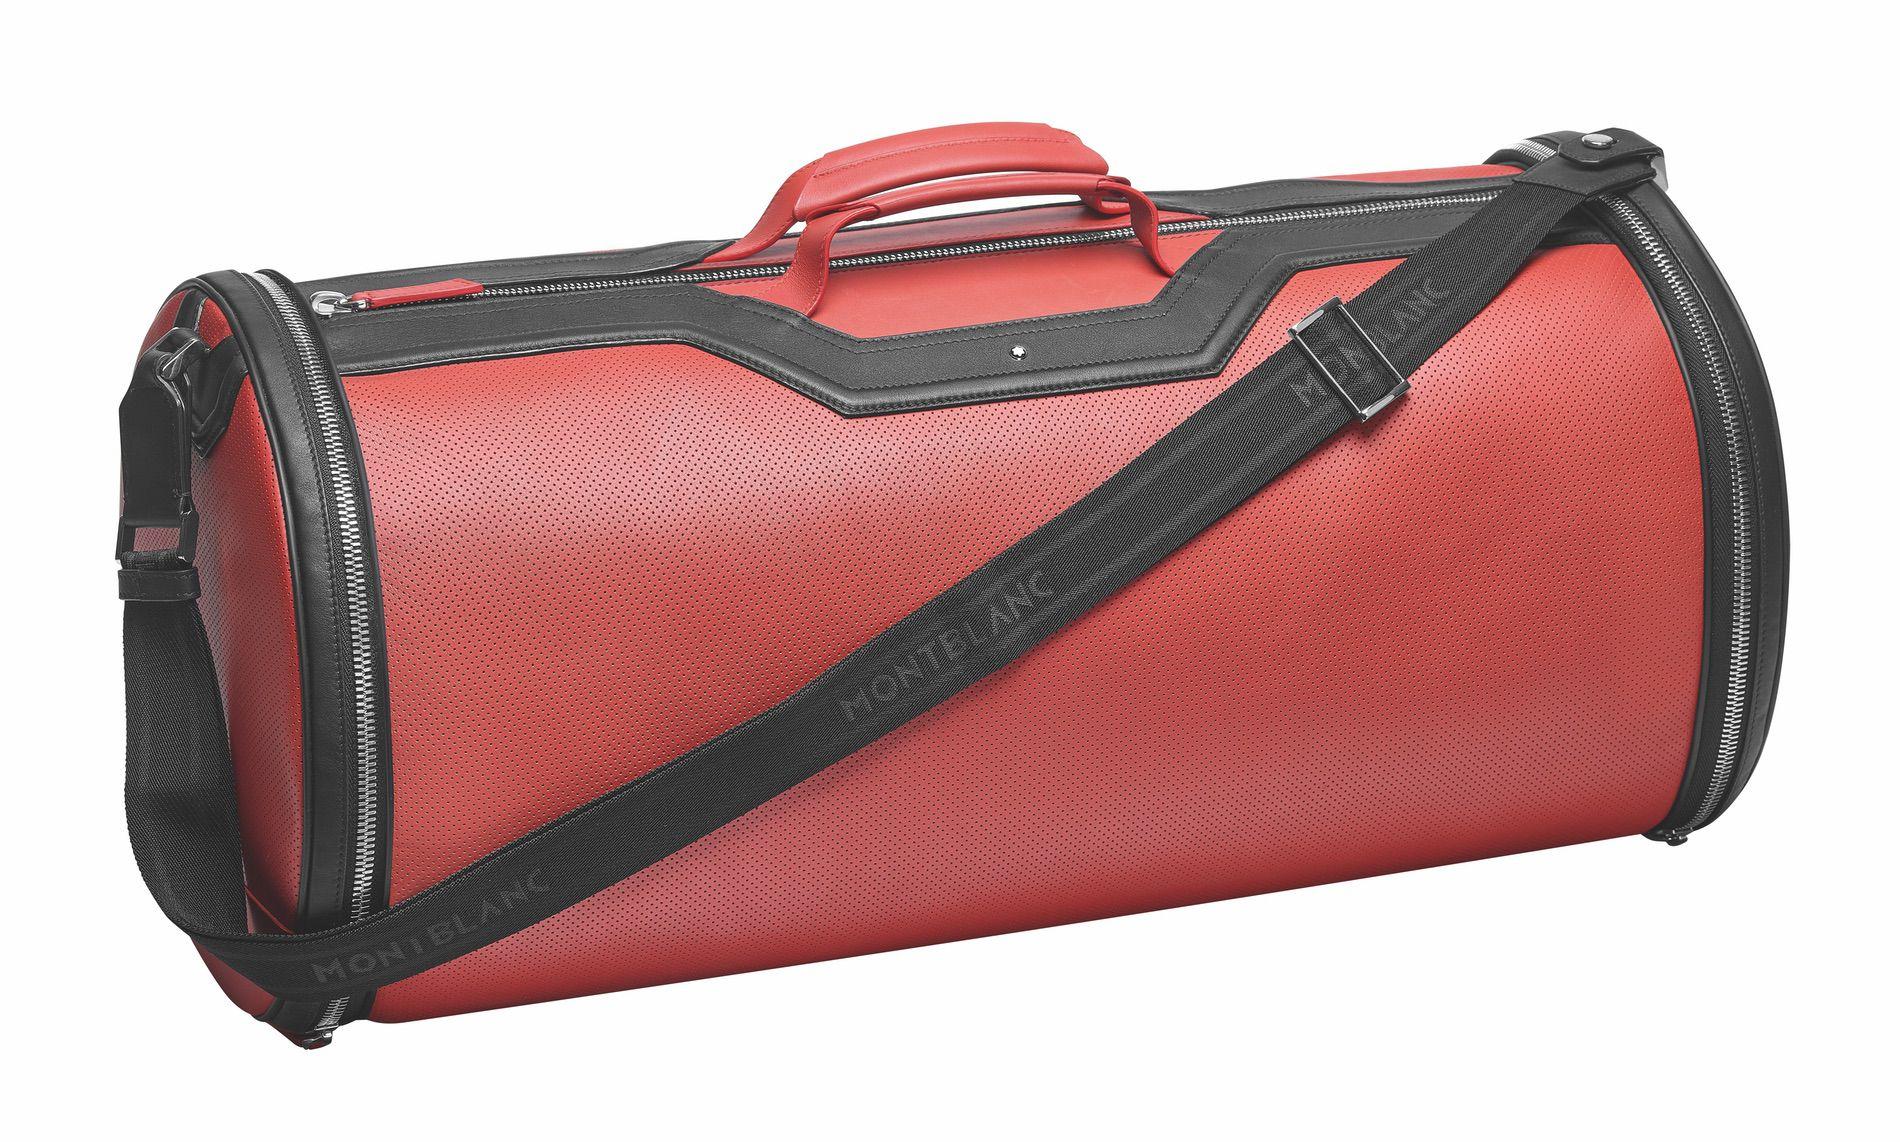 BMW Montblanc luggage 01